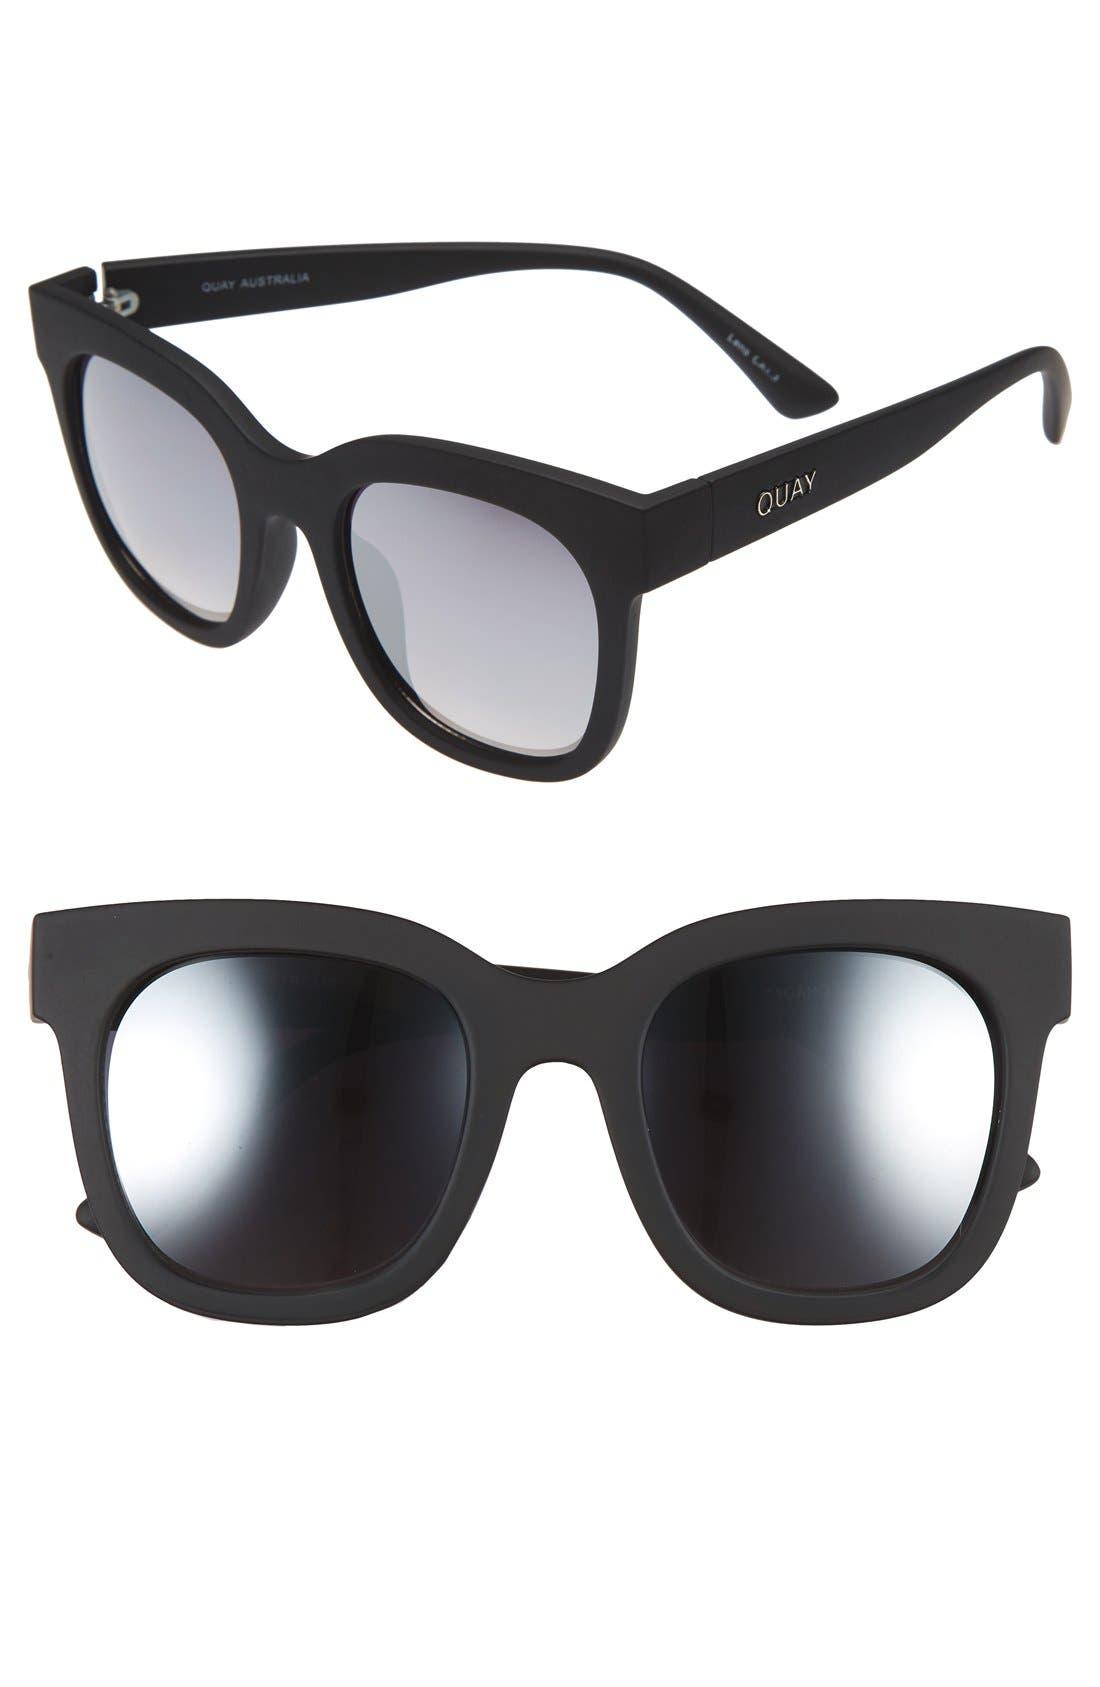 Main Image - Quay Australia 'Sagano' 50mm Square Sunglasses